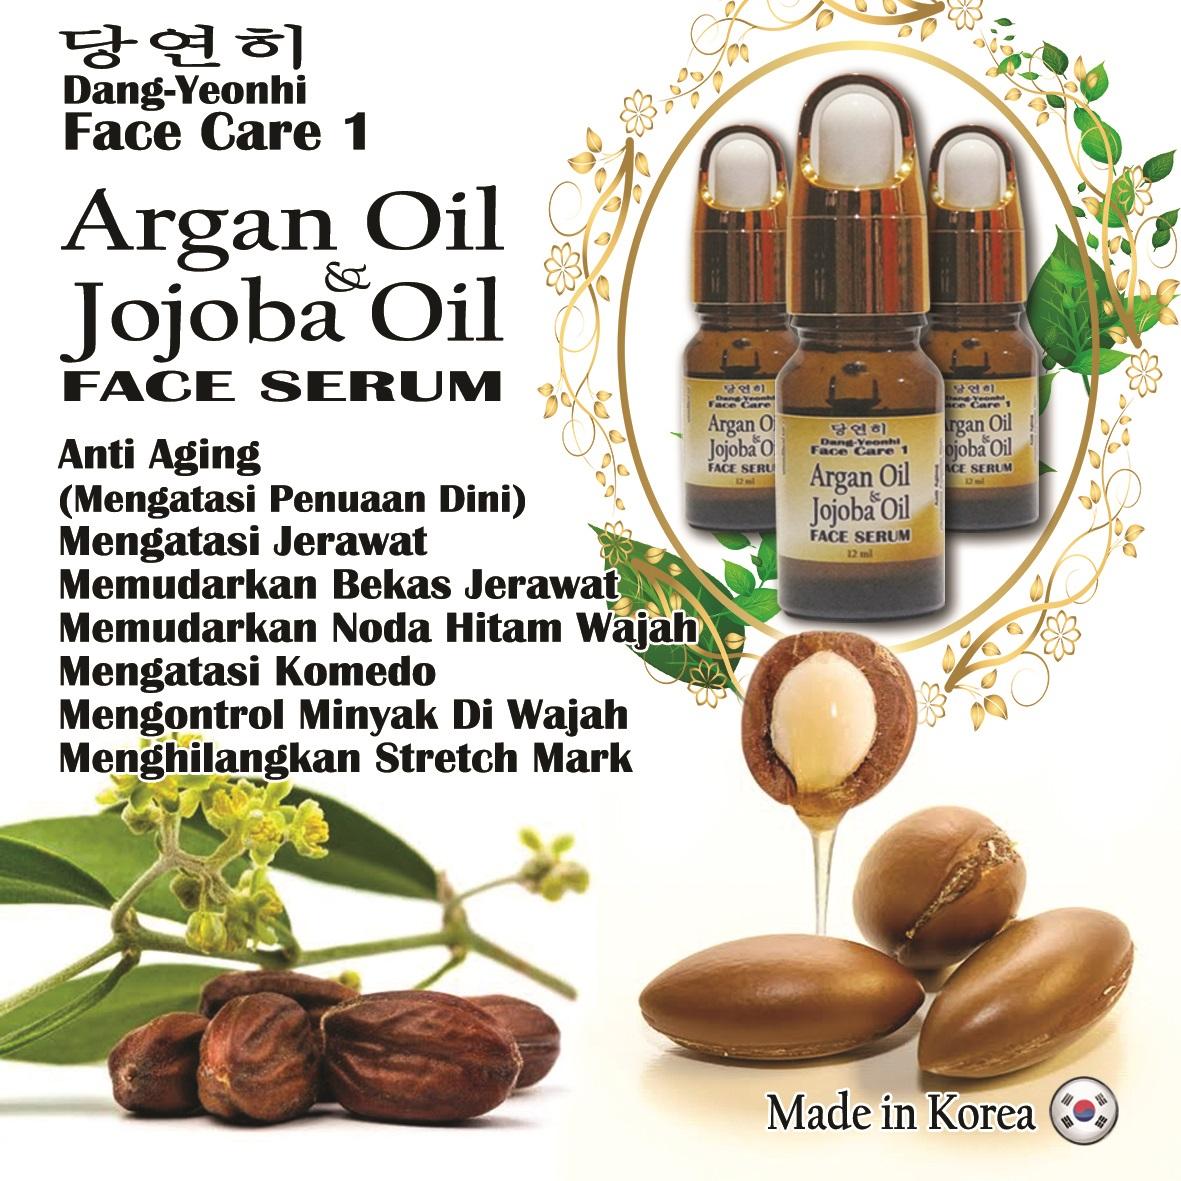 Argan & Jojoba Oil Serum - Dang Yeonhi Face Care 1 thumbnail